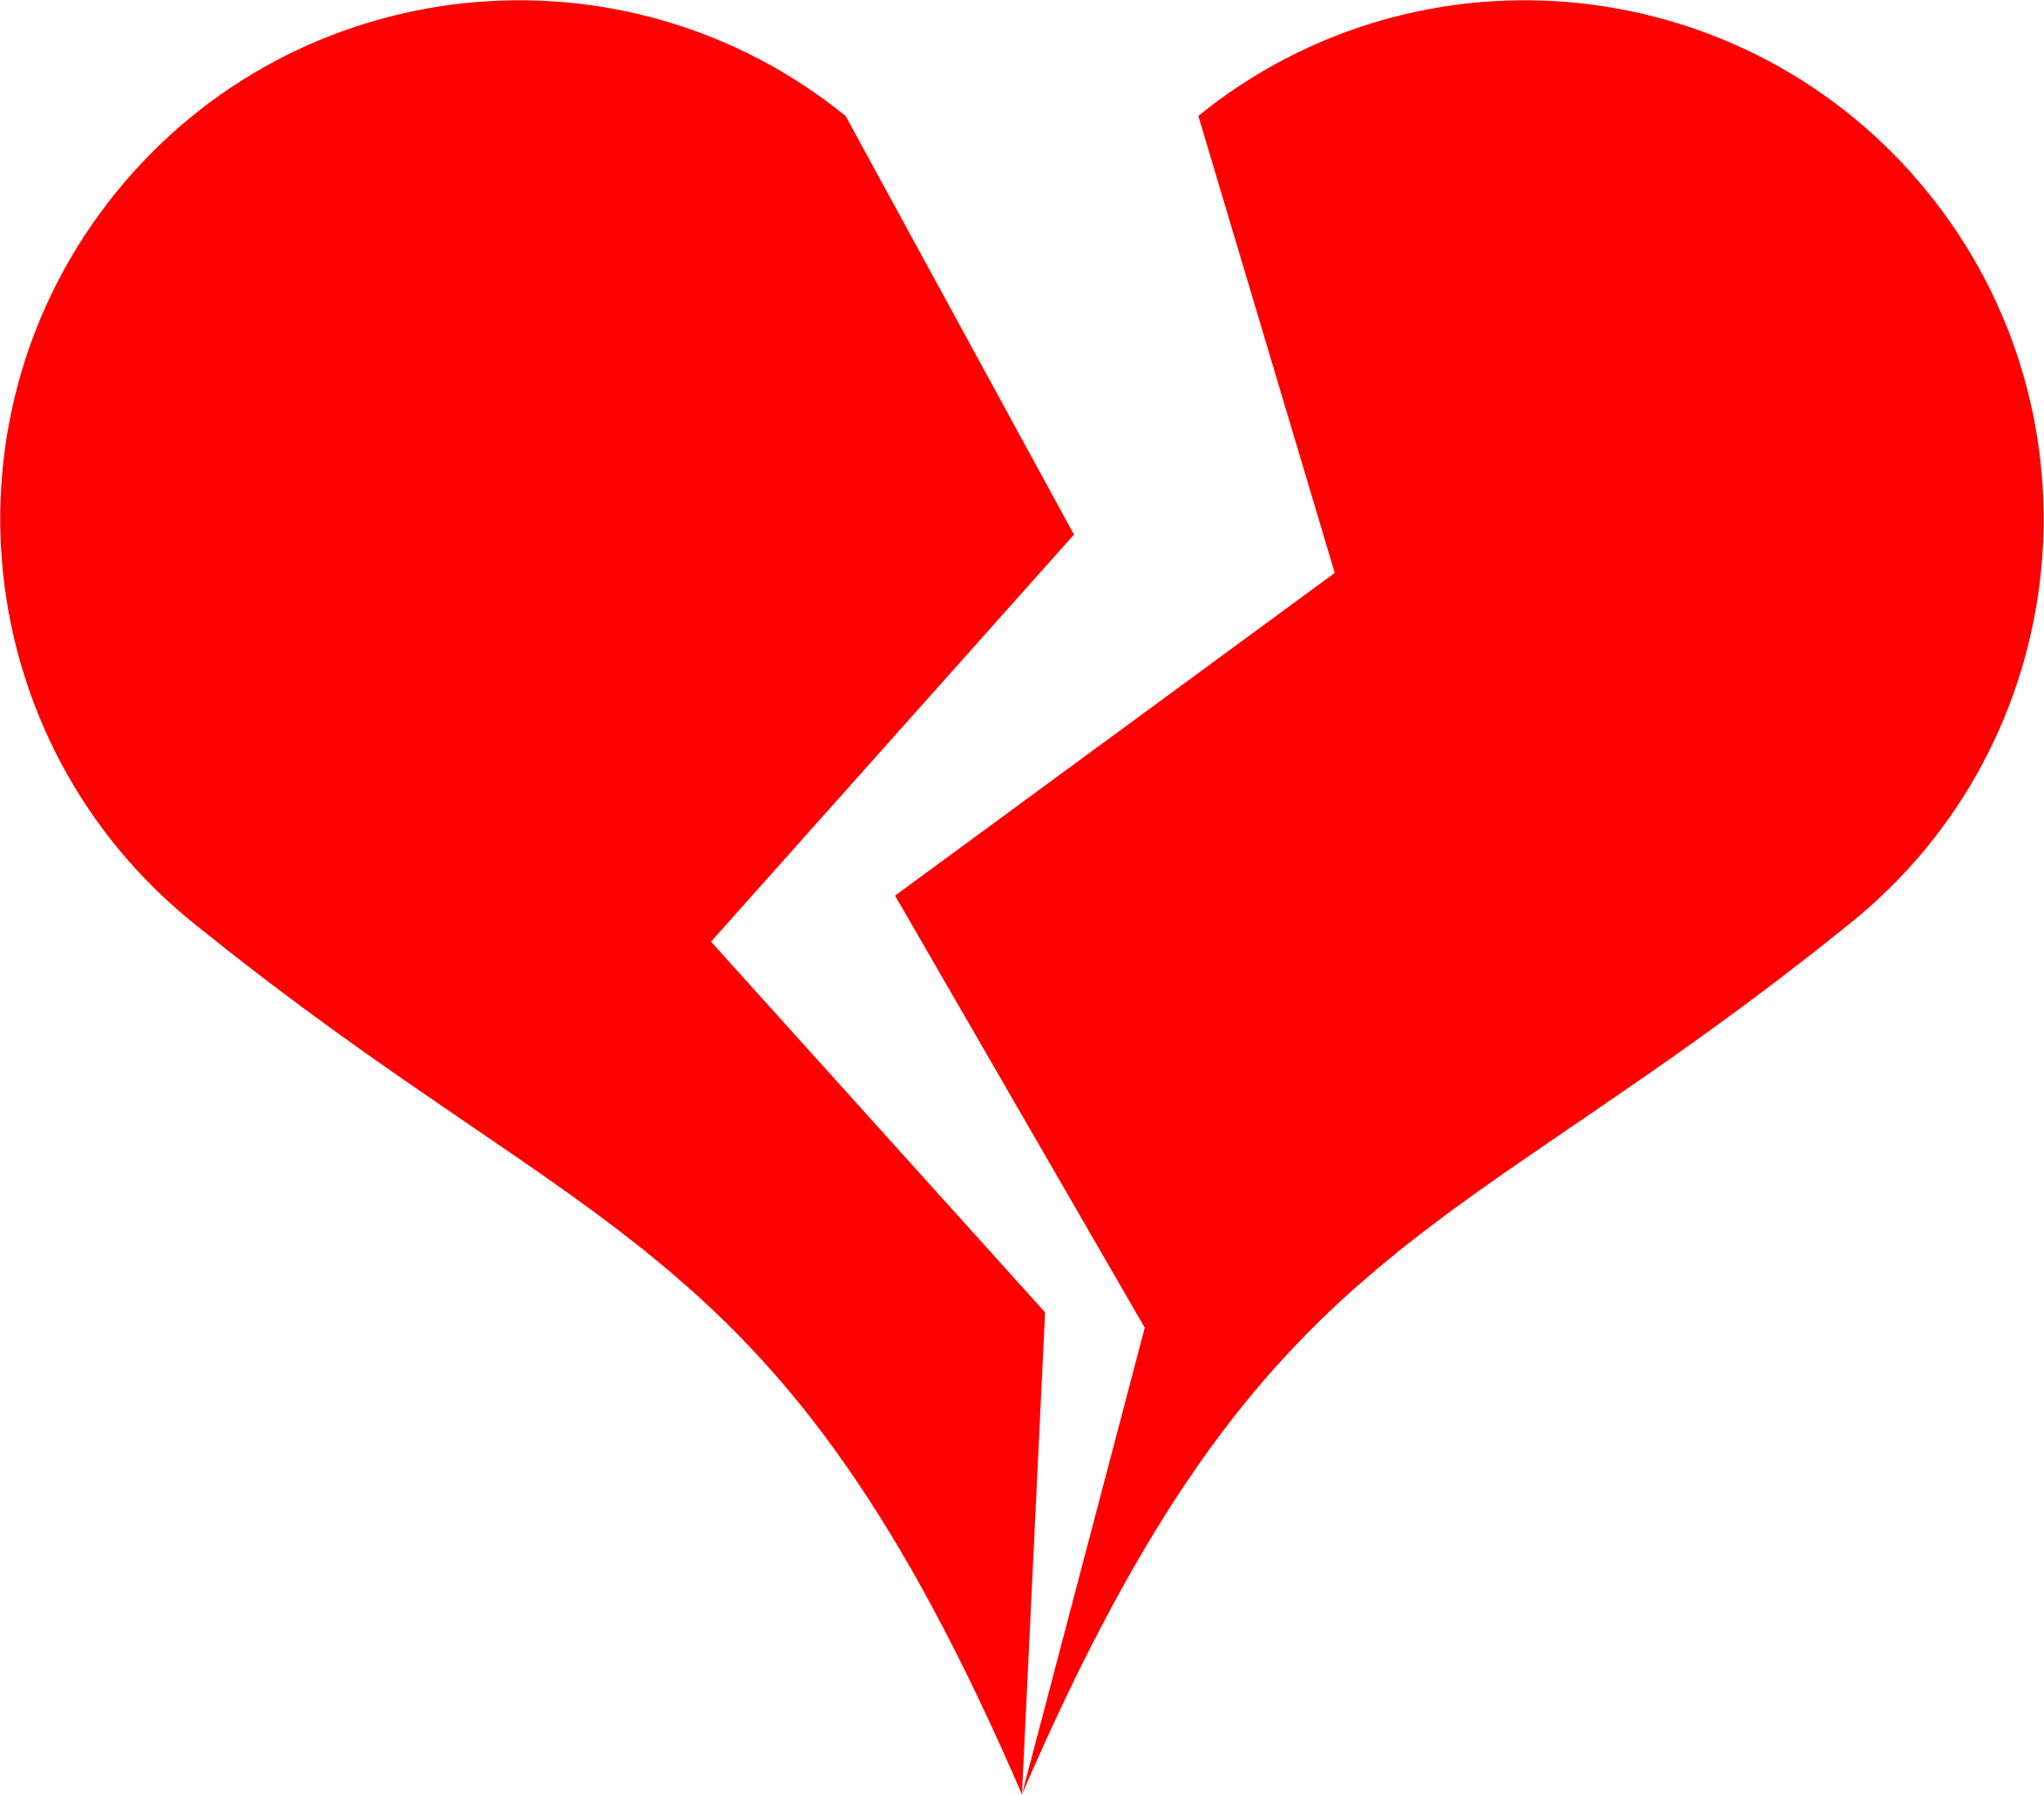 Clipart broken heart vector black and white Clipart - Broken heart vector black and white